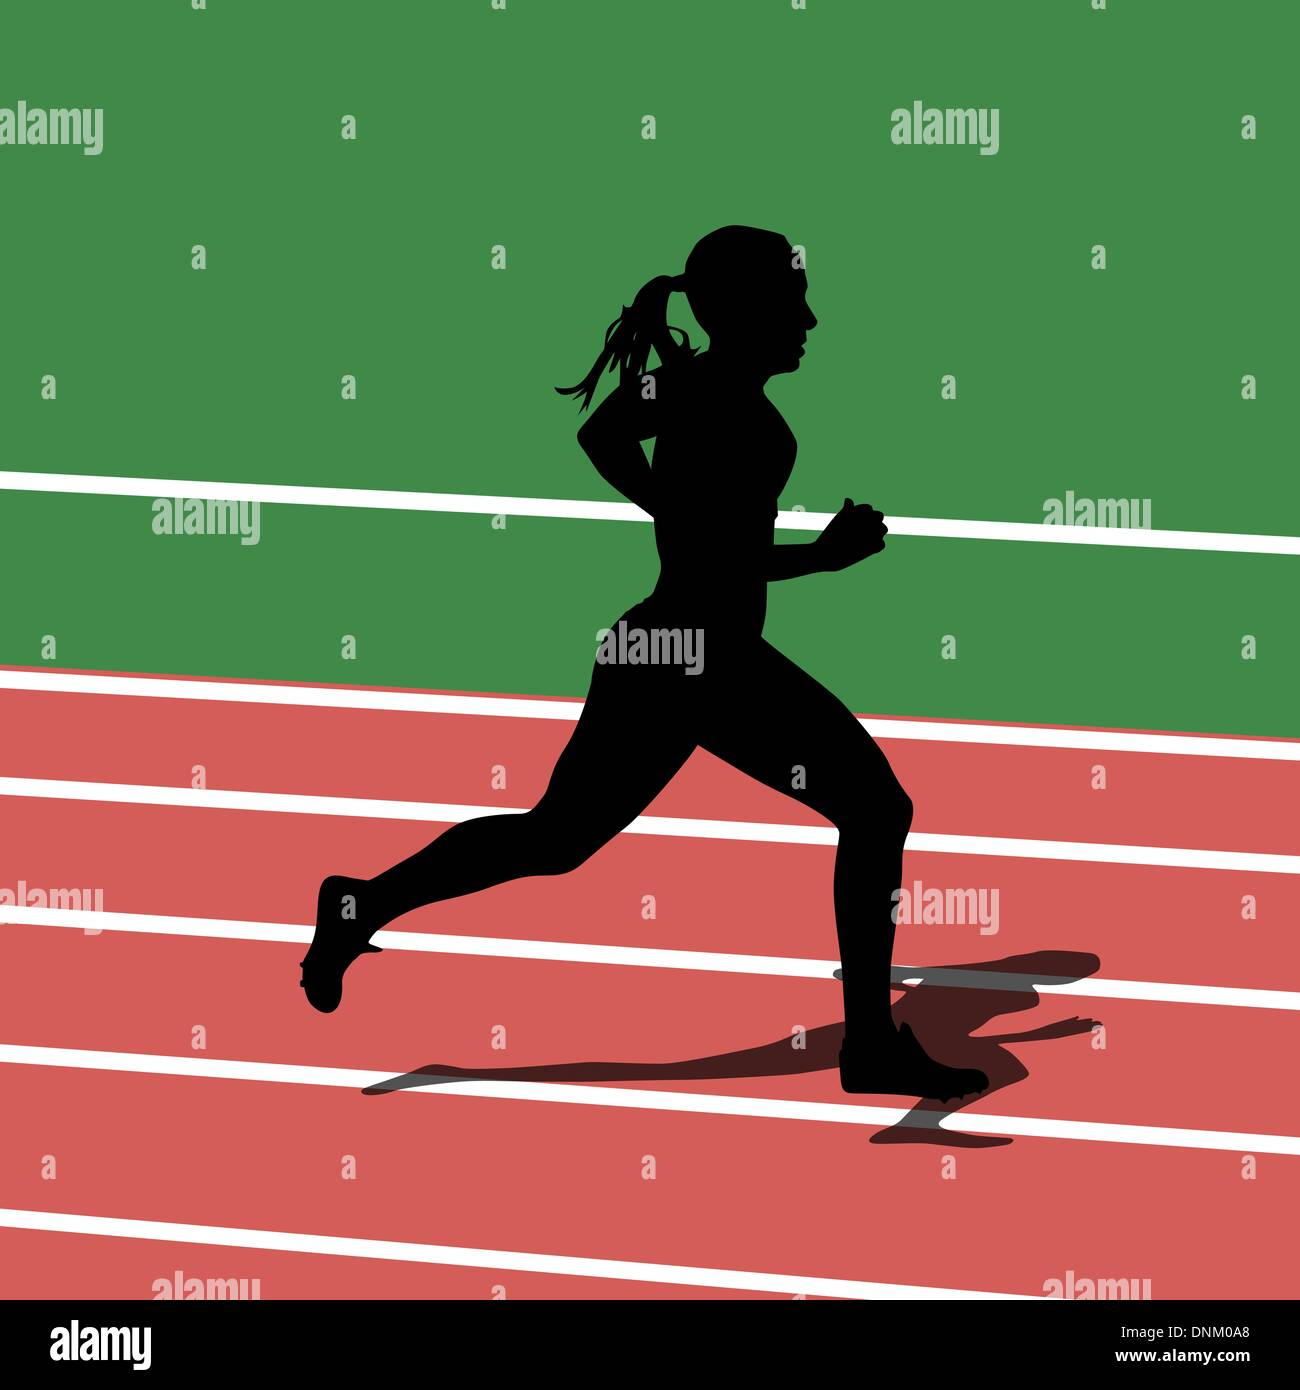 Silhouetten im Sportstadion ausgeführt. Vektor-Illustration. Stockbild